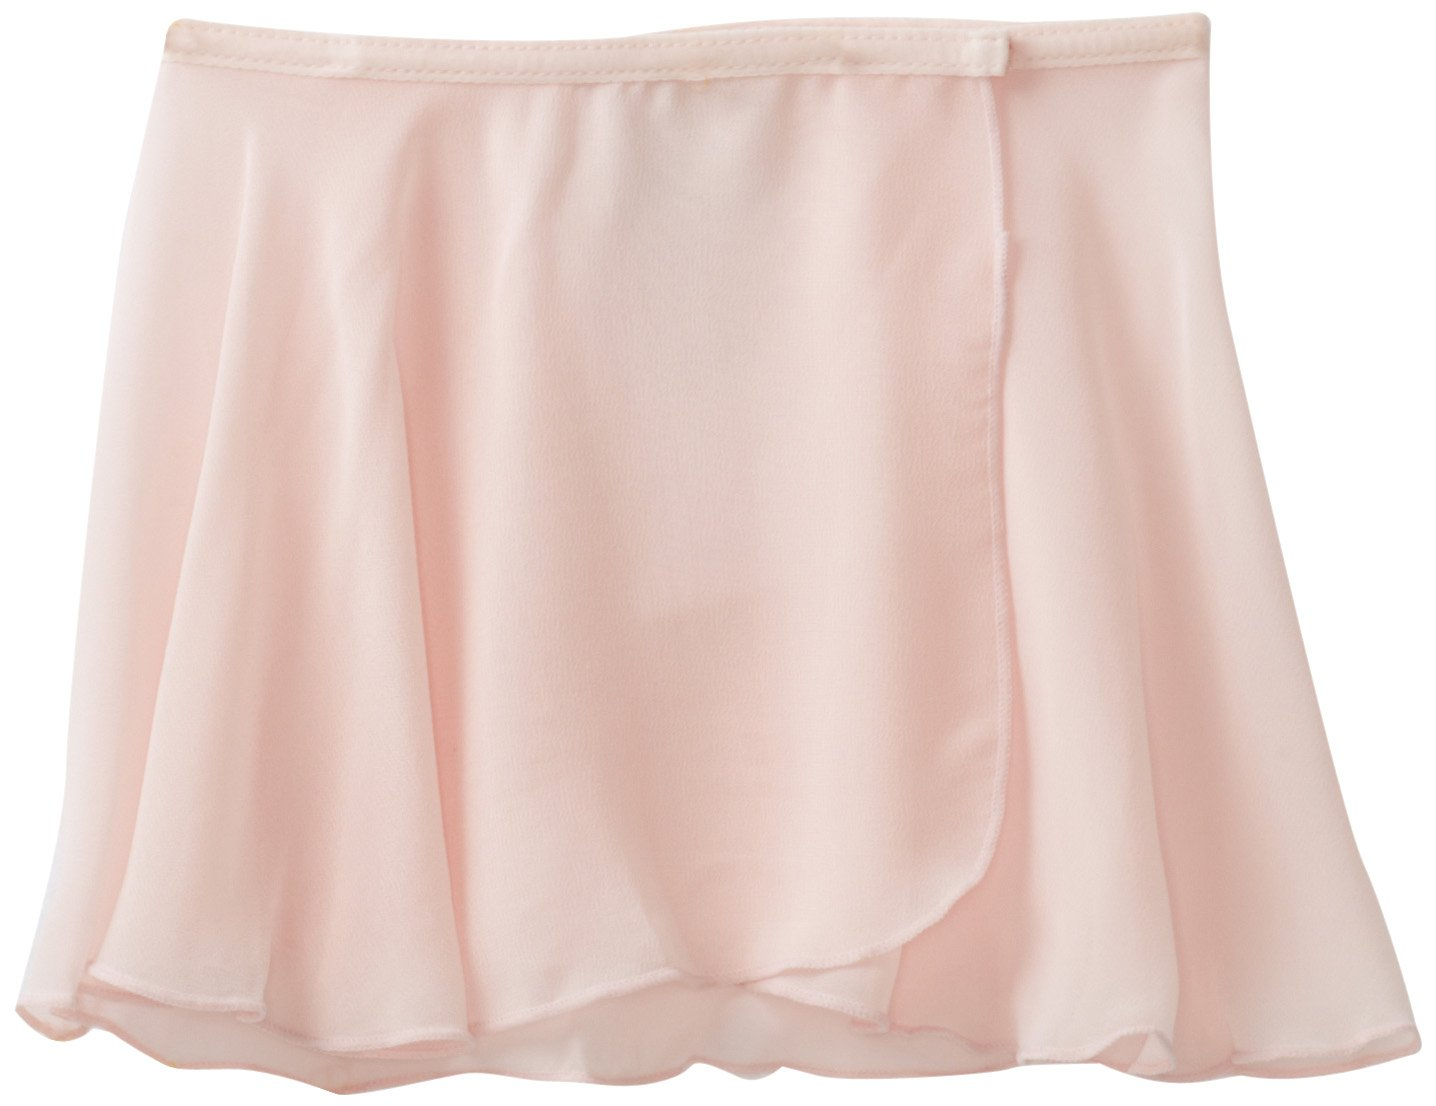 Danskin Little Girls' Wrap Skirt, Theatrical Pink, Small/Intermediate